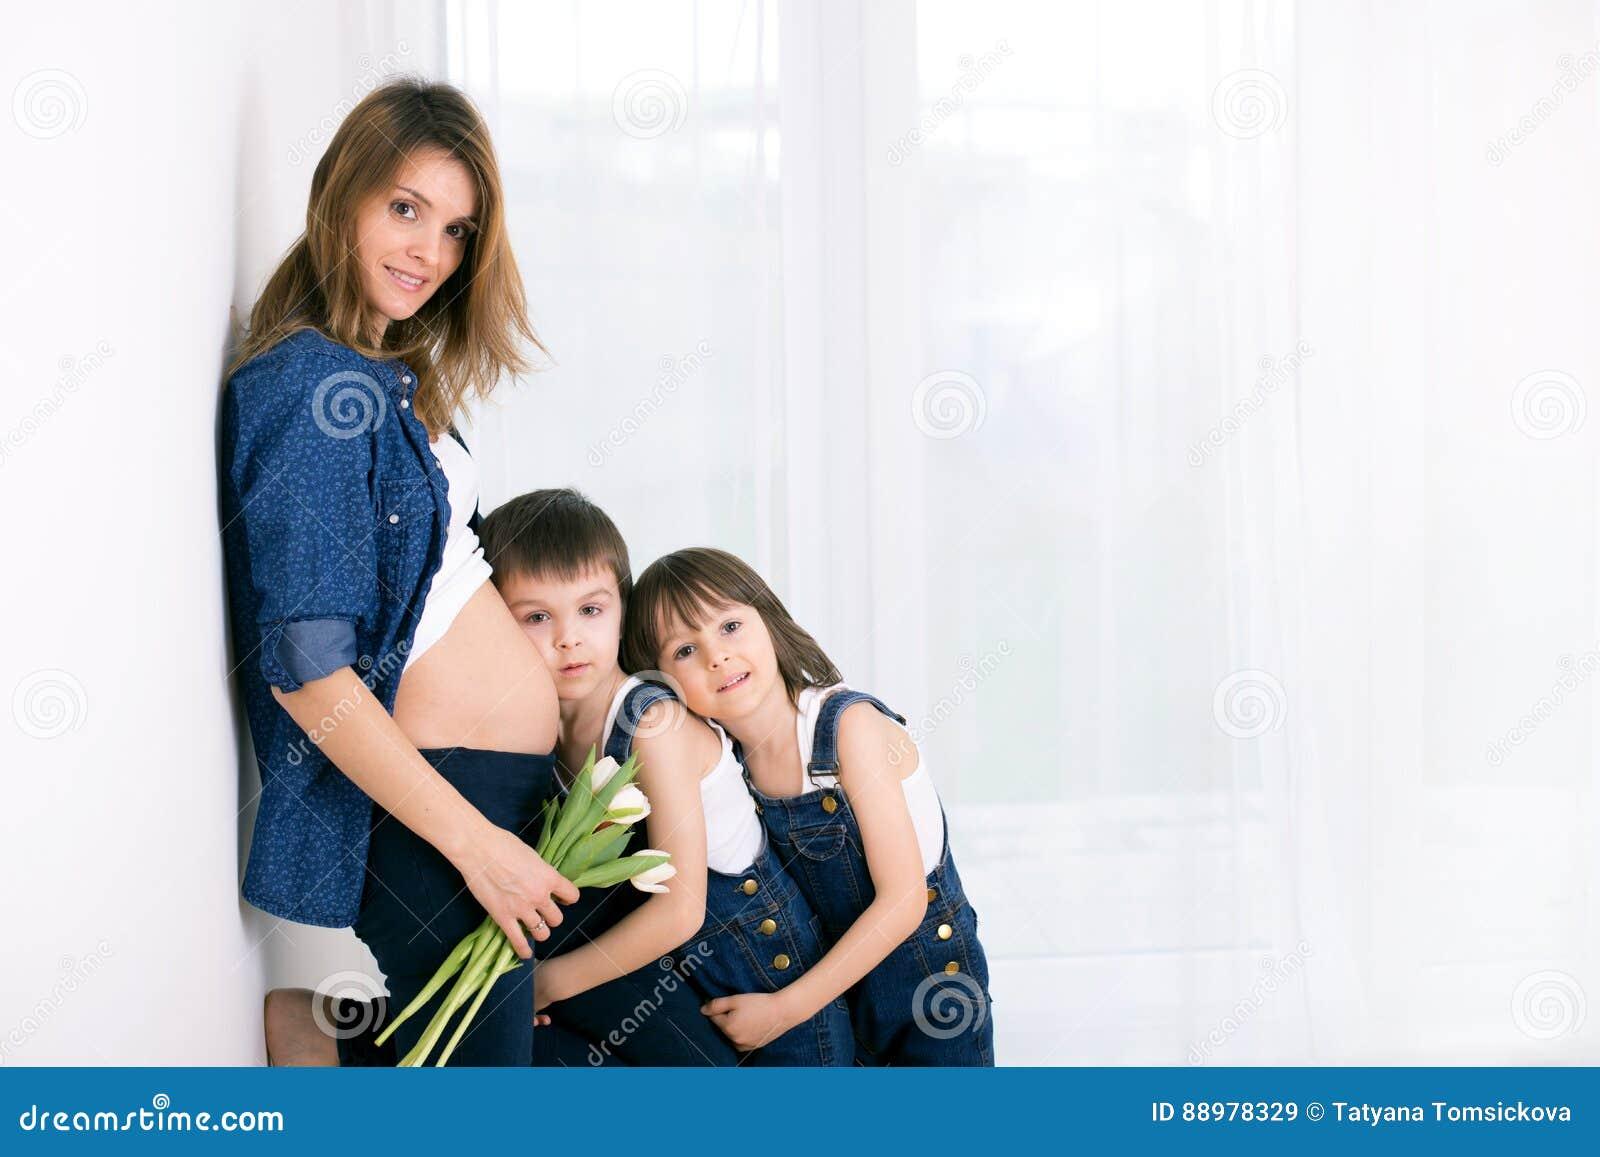 Pregnant mother, hugging her children, receiving tulips, flowers